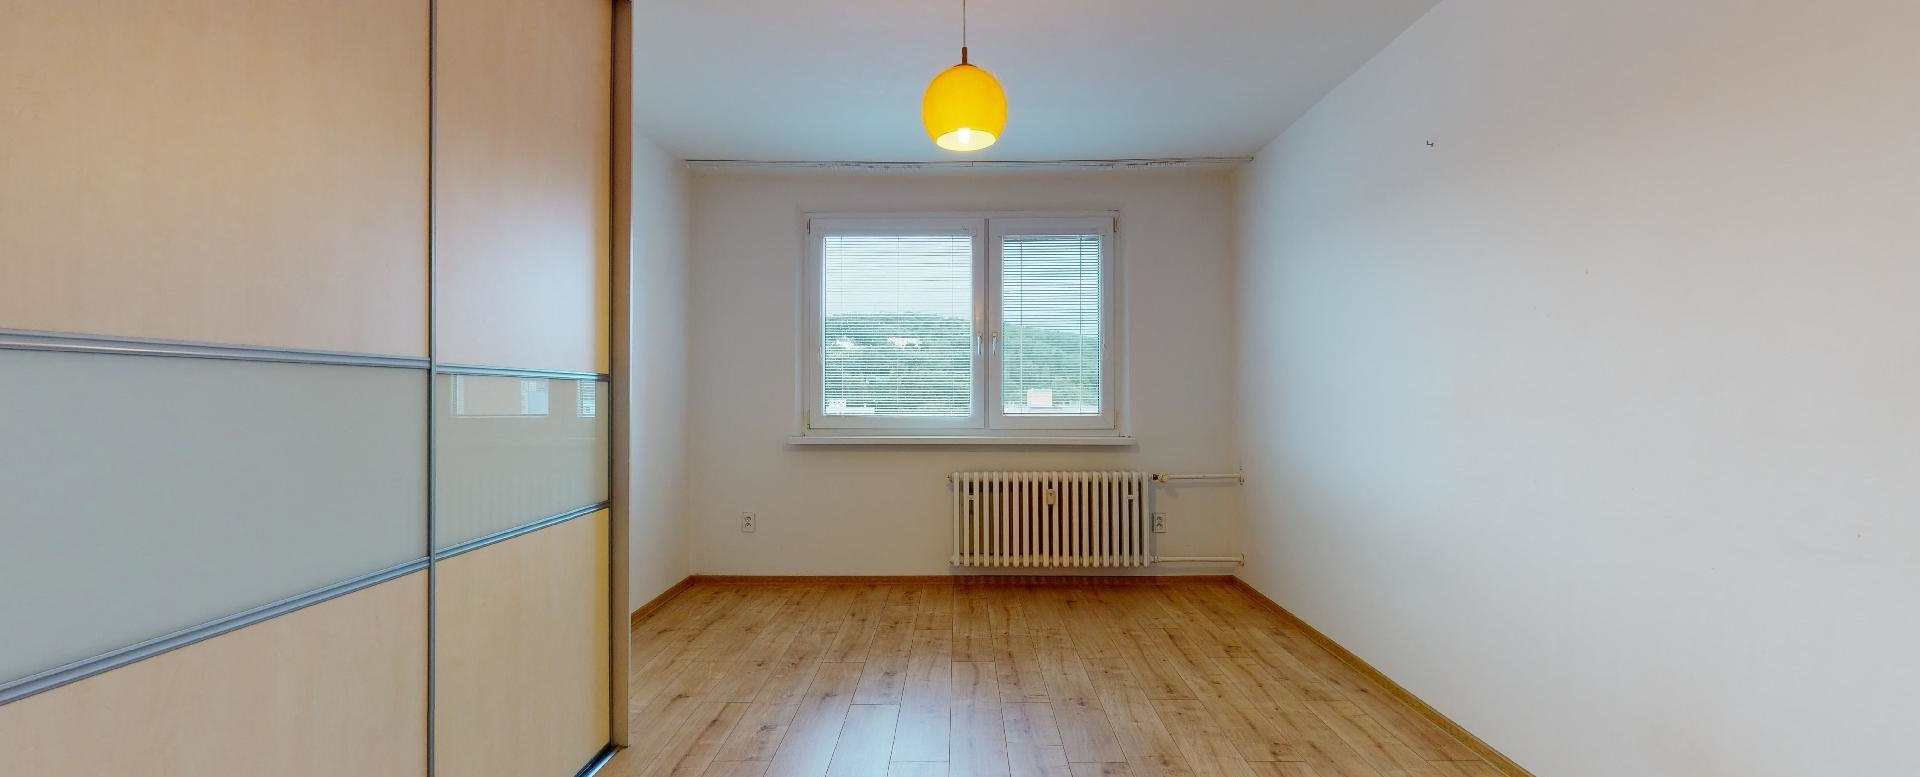 Izba so vstavanou skriňou v 2-izbovom byte na Považanovej ulici v Dúbravke